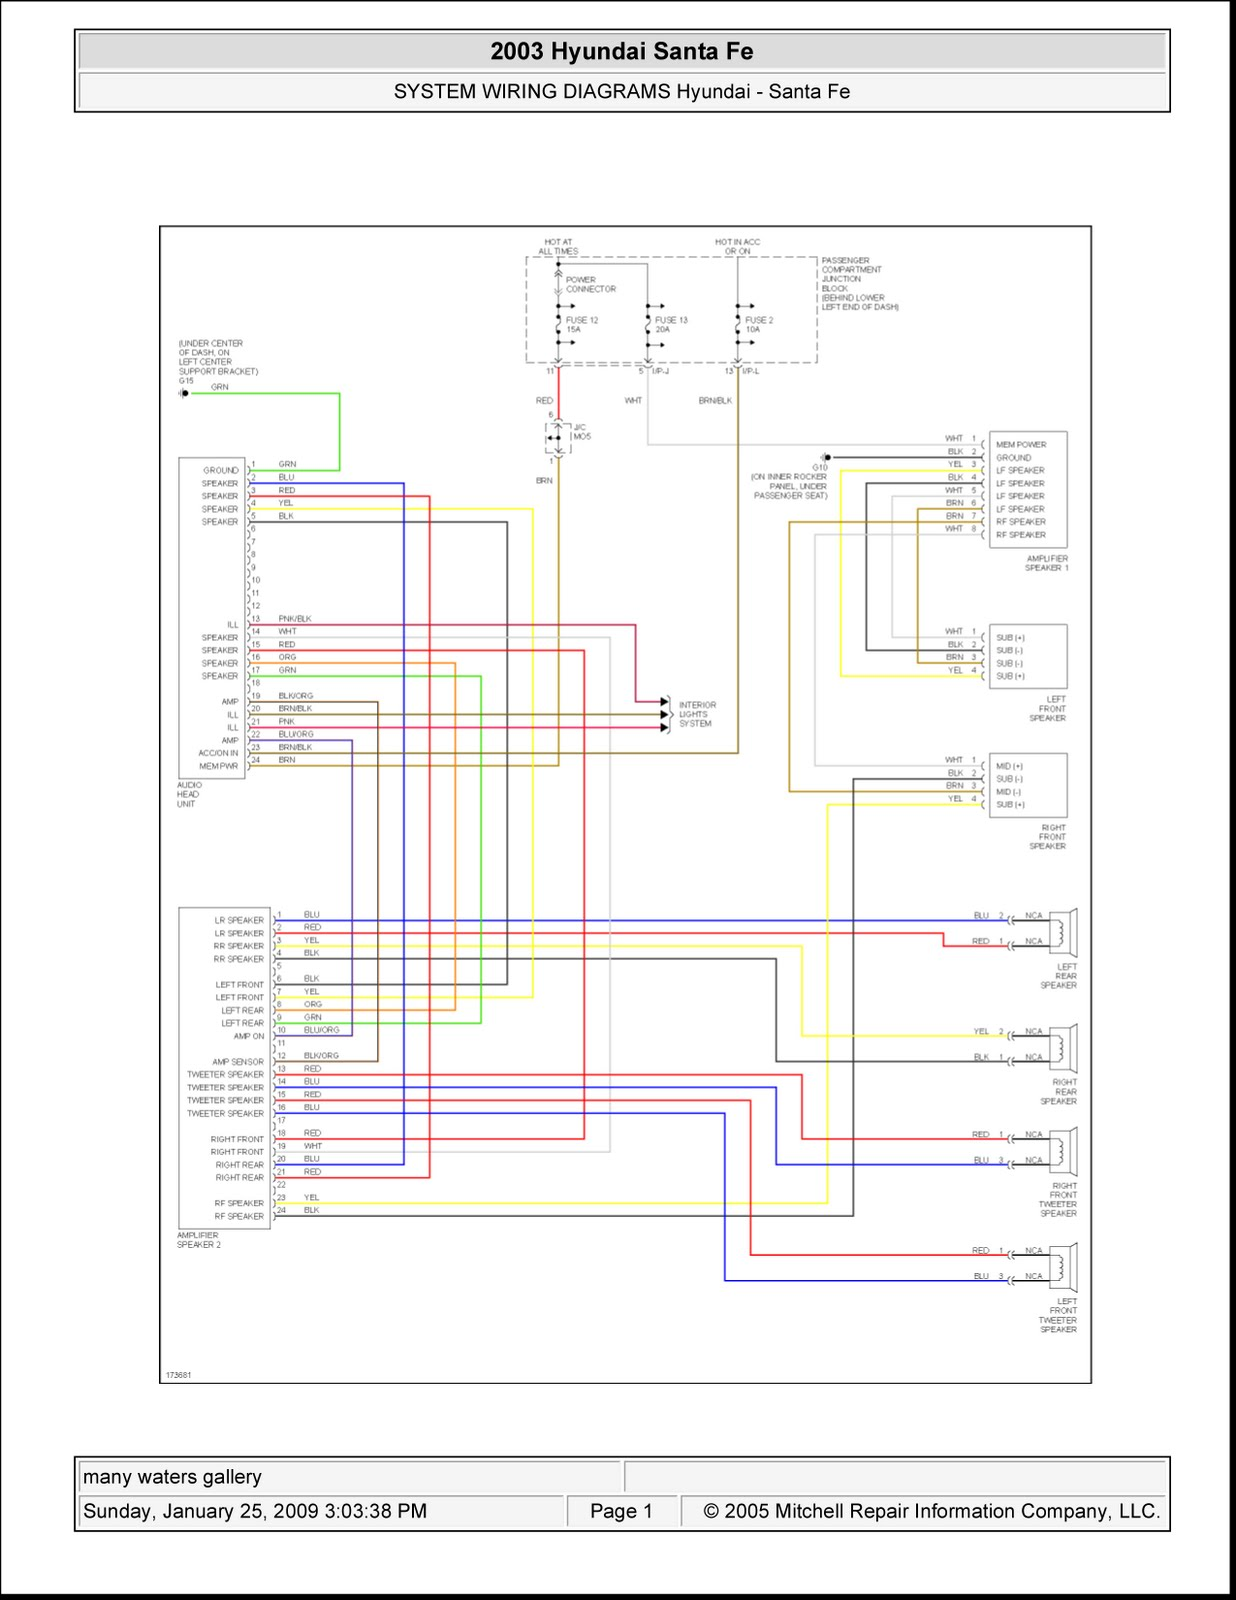 2004 Hyundai Santa Fe Wiring Diagram